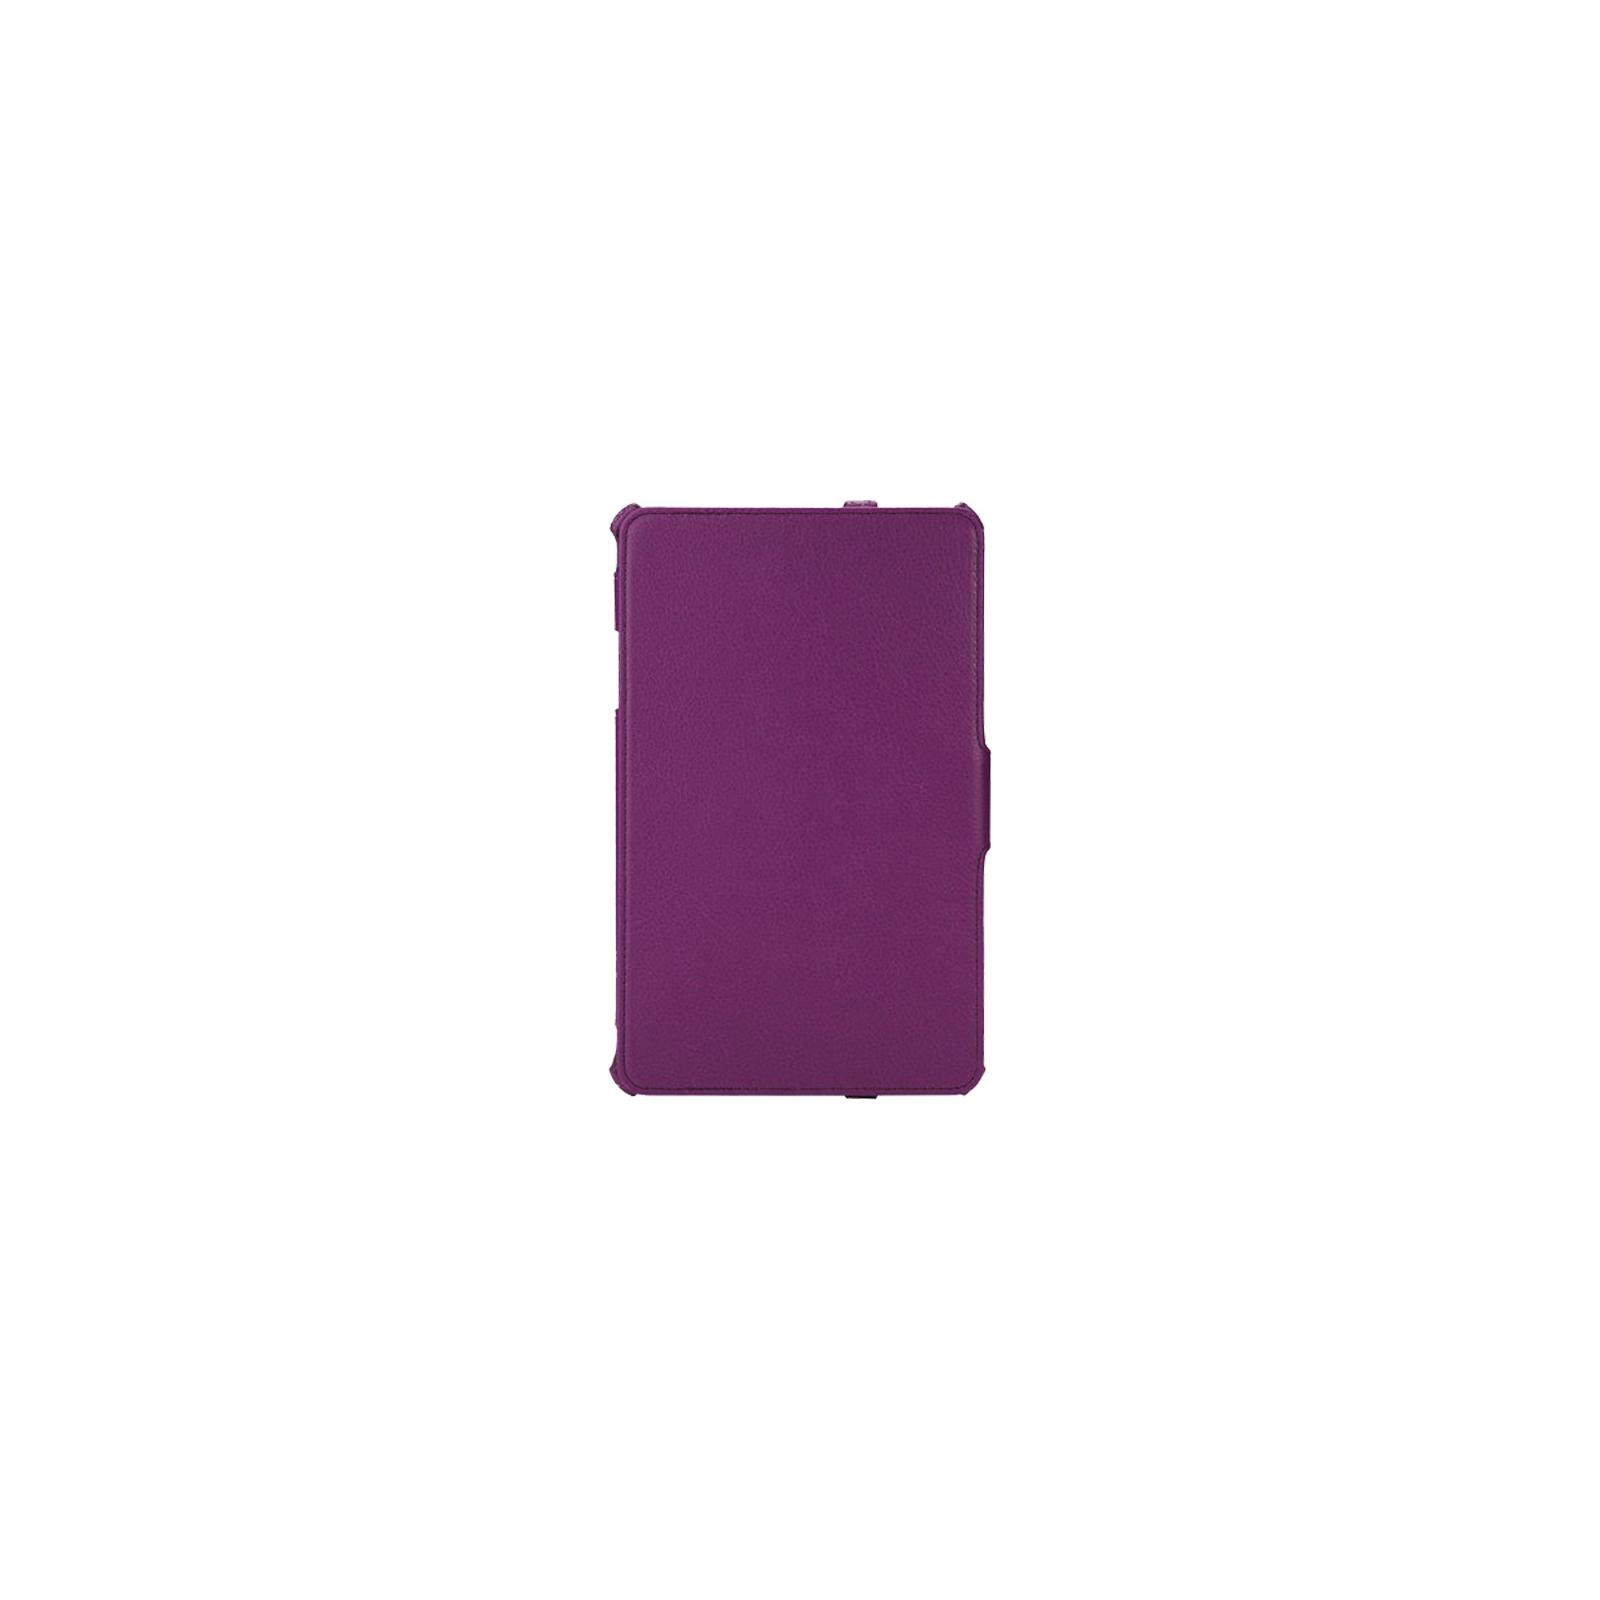 Чехол для планшета AirOn для Samsung Galaxy Tab E 9.6 vio (4822352776329)